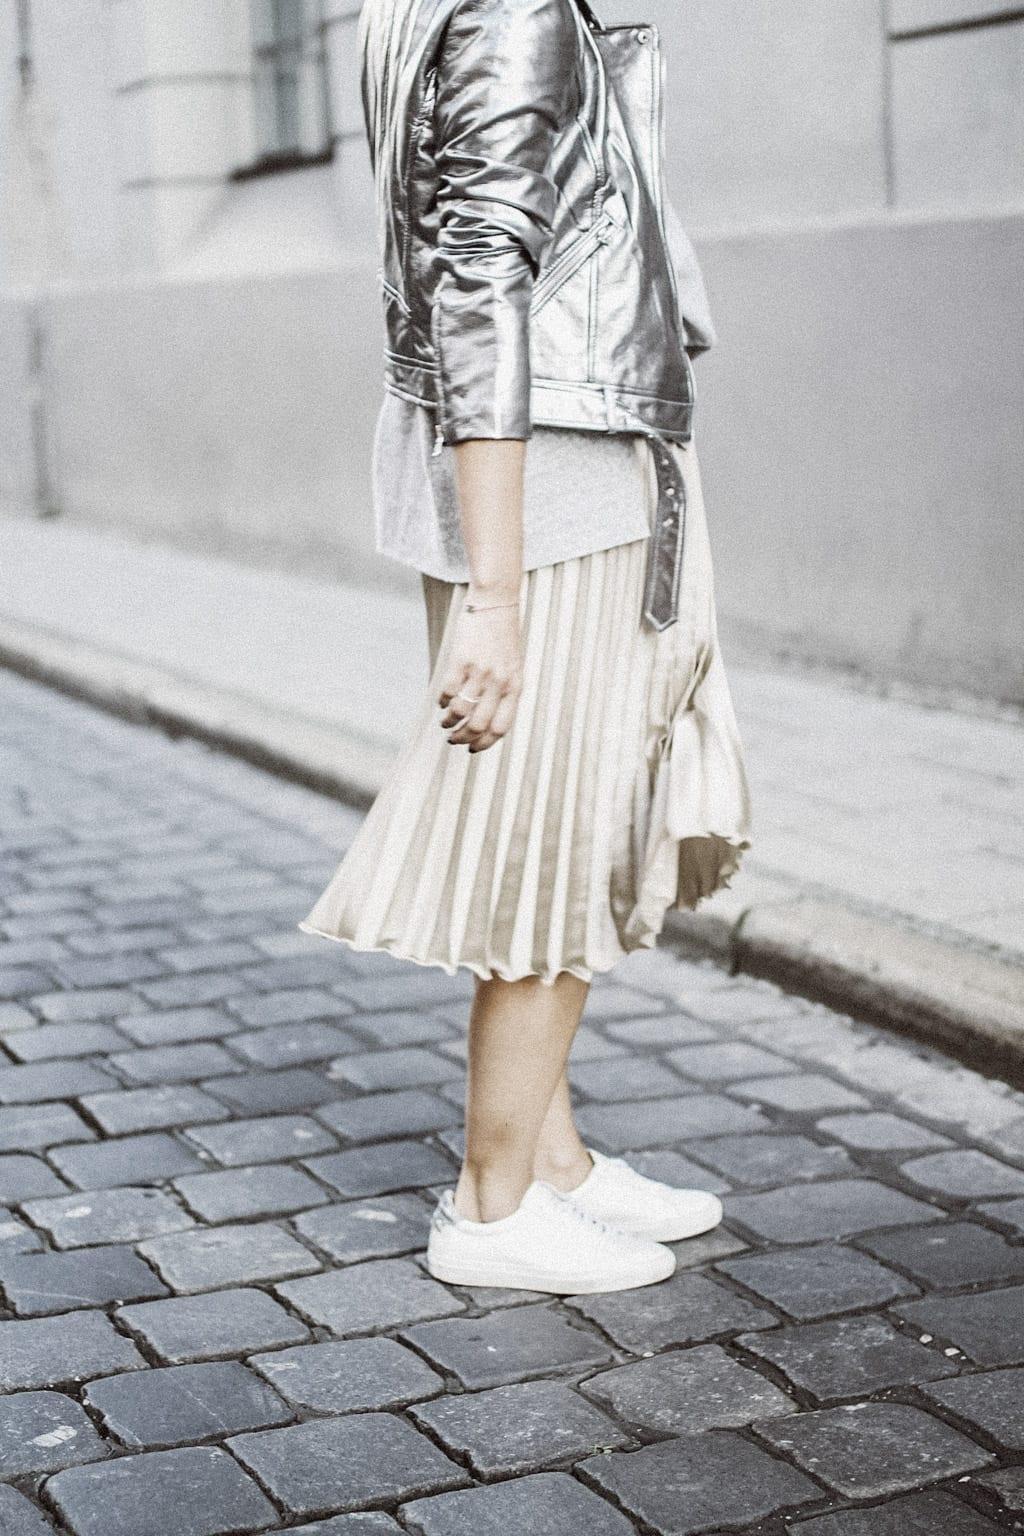 ck-constantlyk-com-karin-kaswurm-street-style-fashion-silver-leather-jacket-plissee-6864